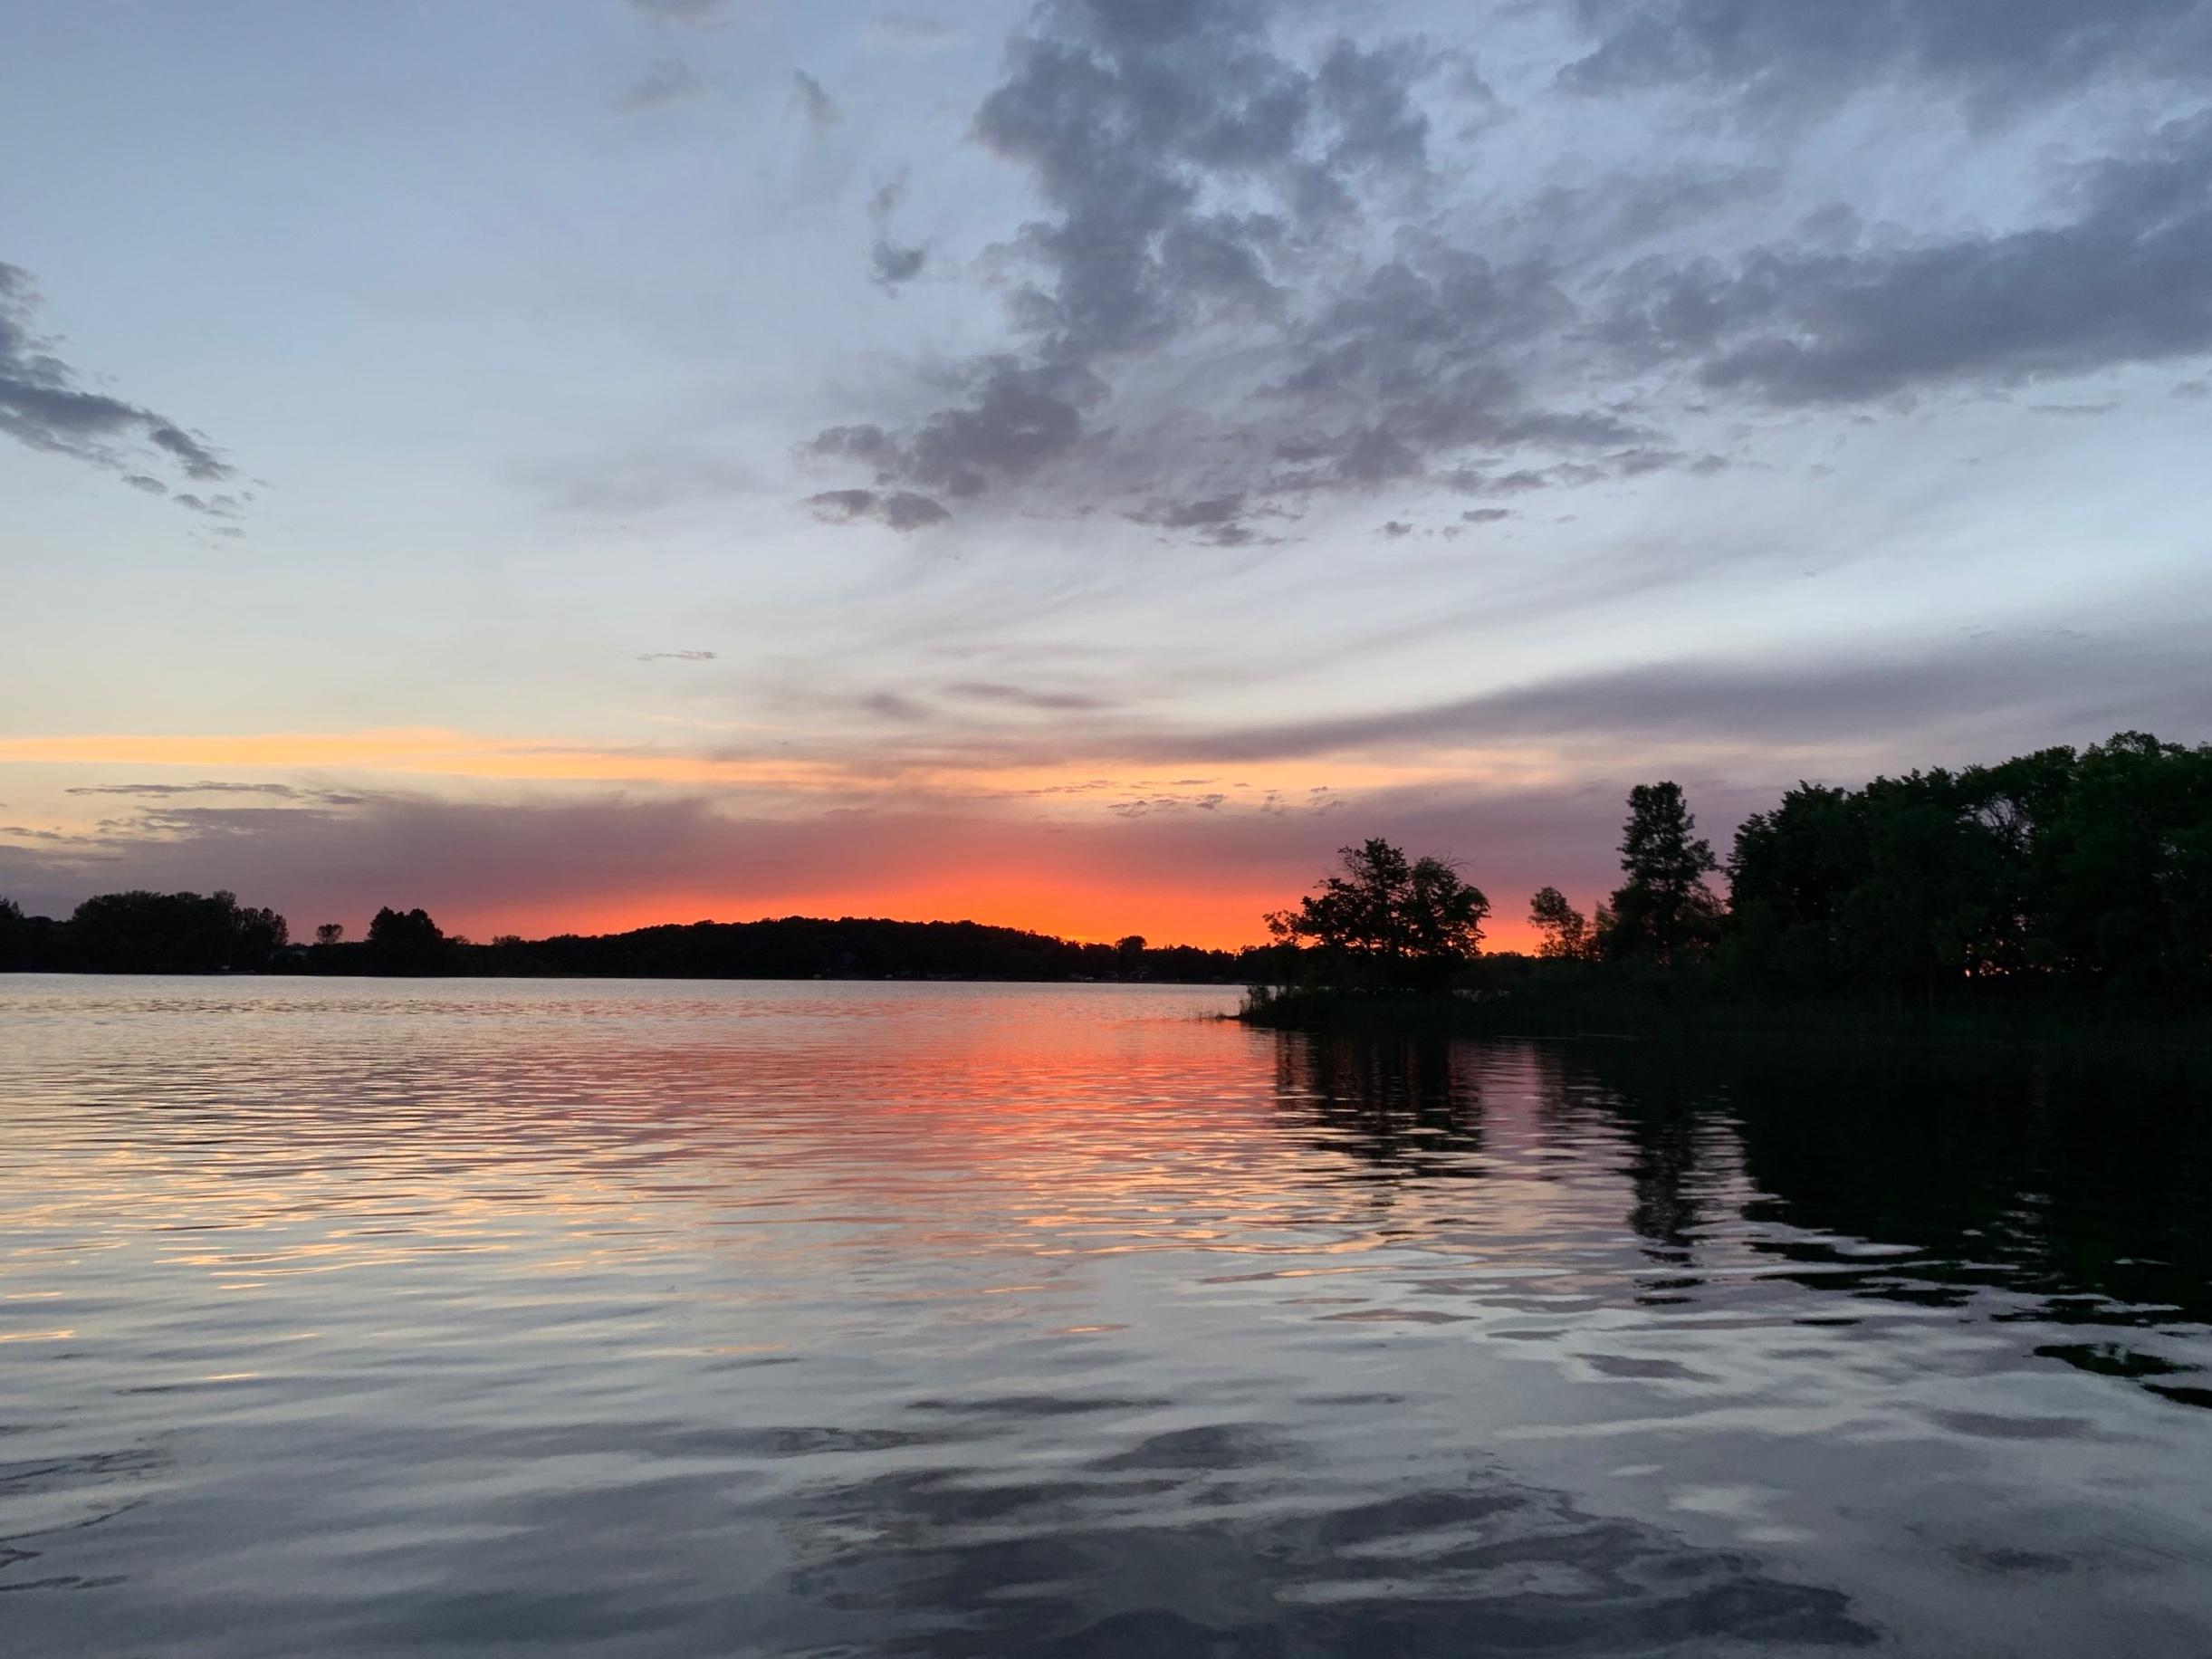 Sunset on the lake, Minnesota